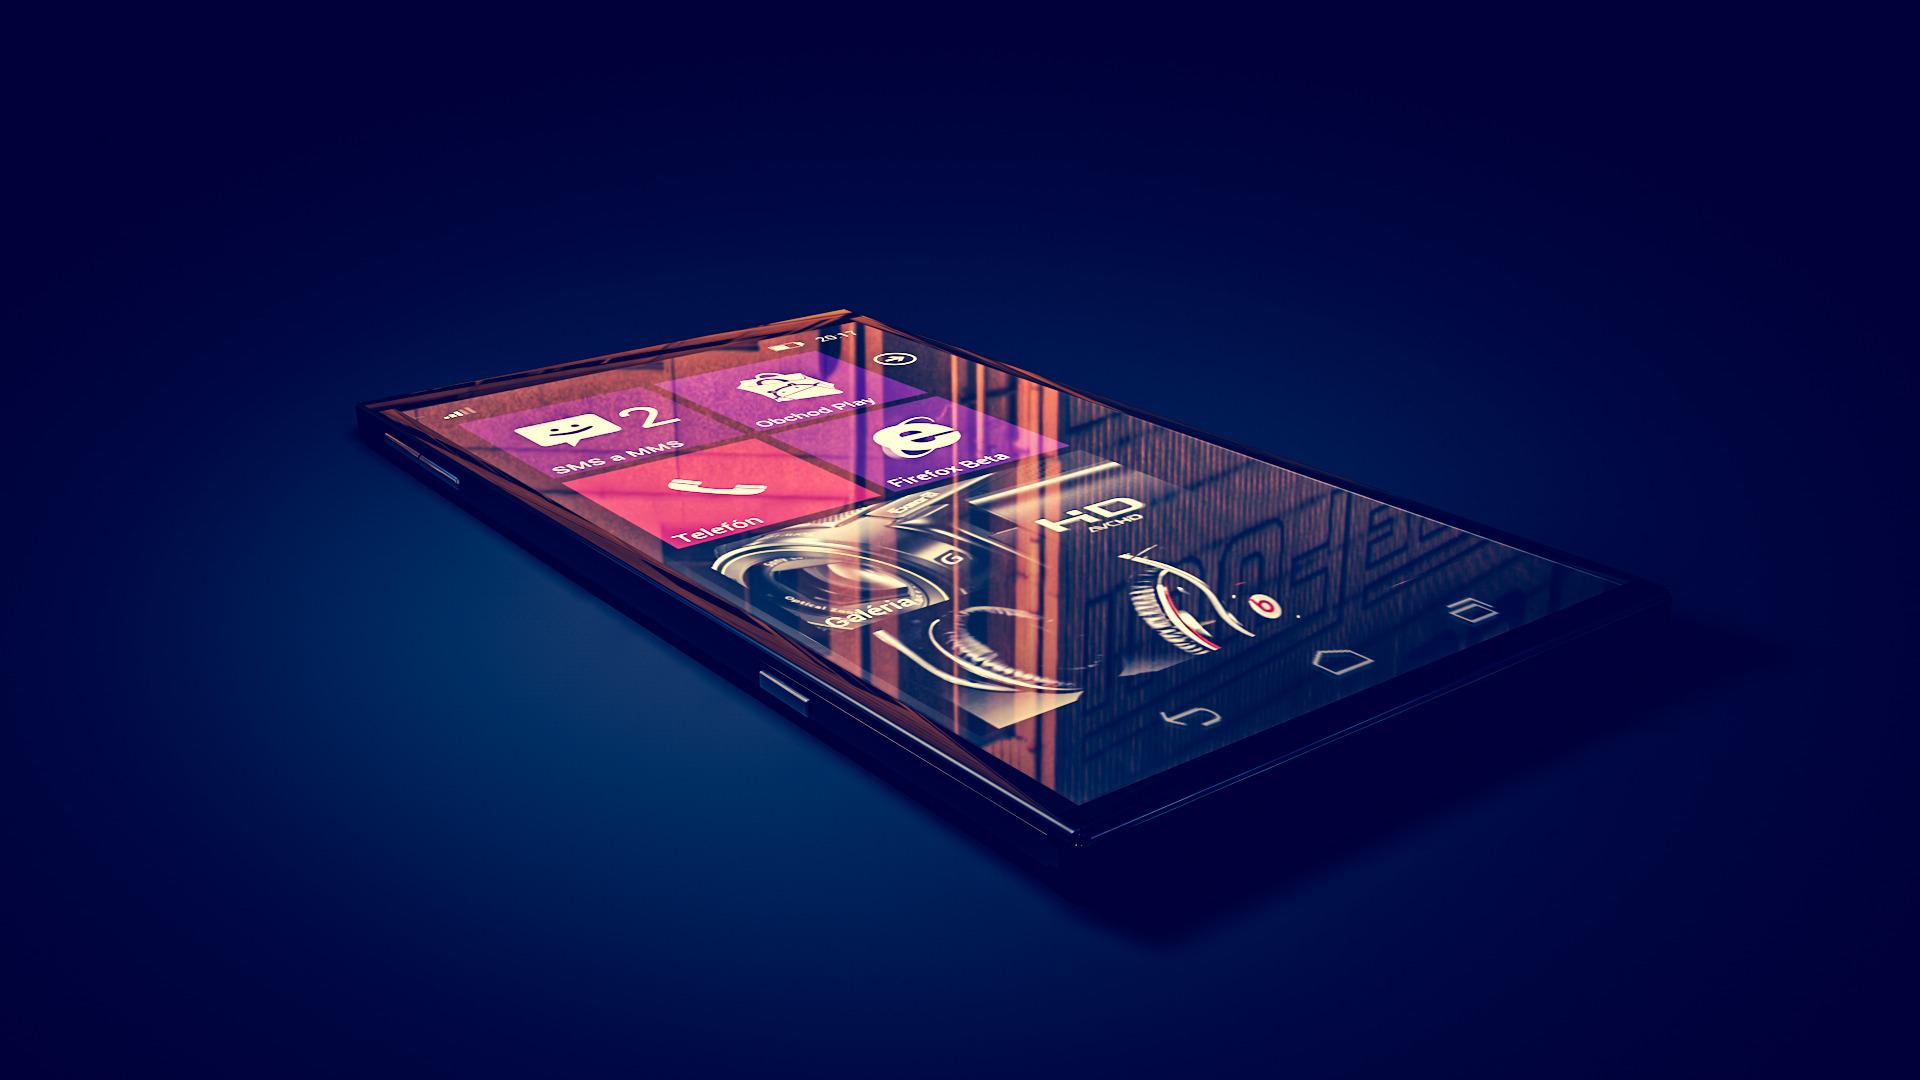 Windows Phone Wallpaper 10090 1920x1080